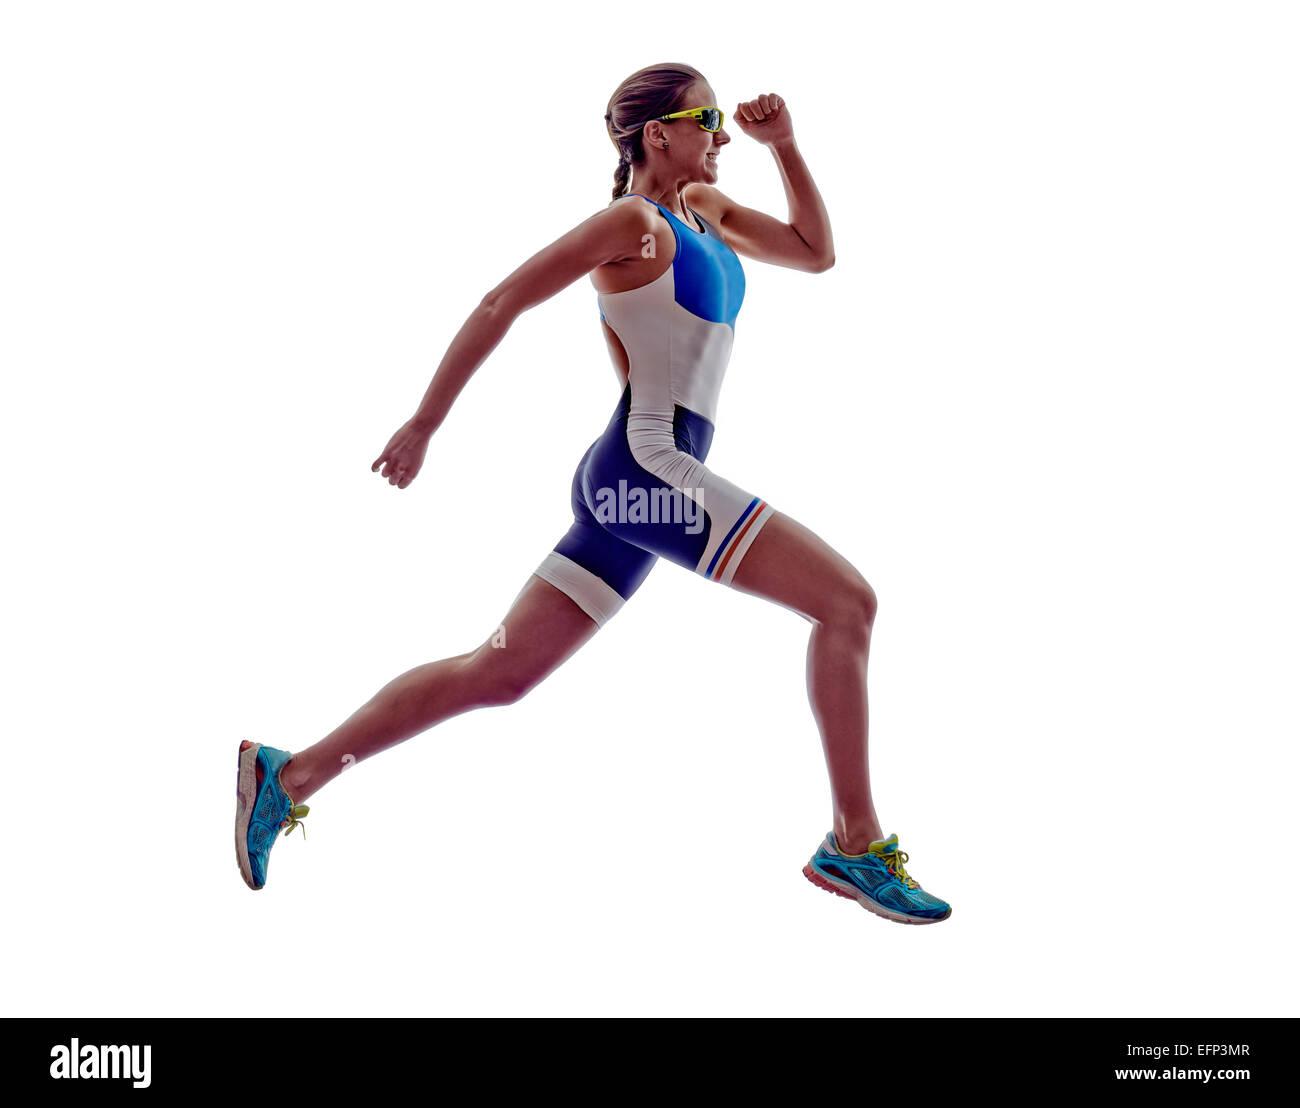 Femme triathlon Ironman runner exécuté sur fond blanc Photo Stock